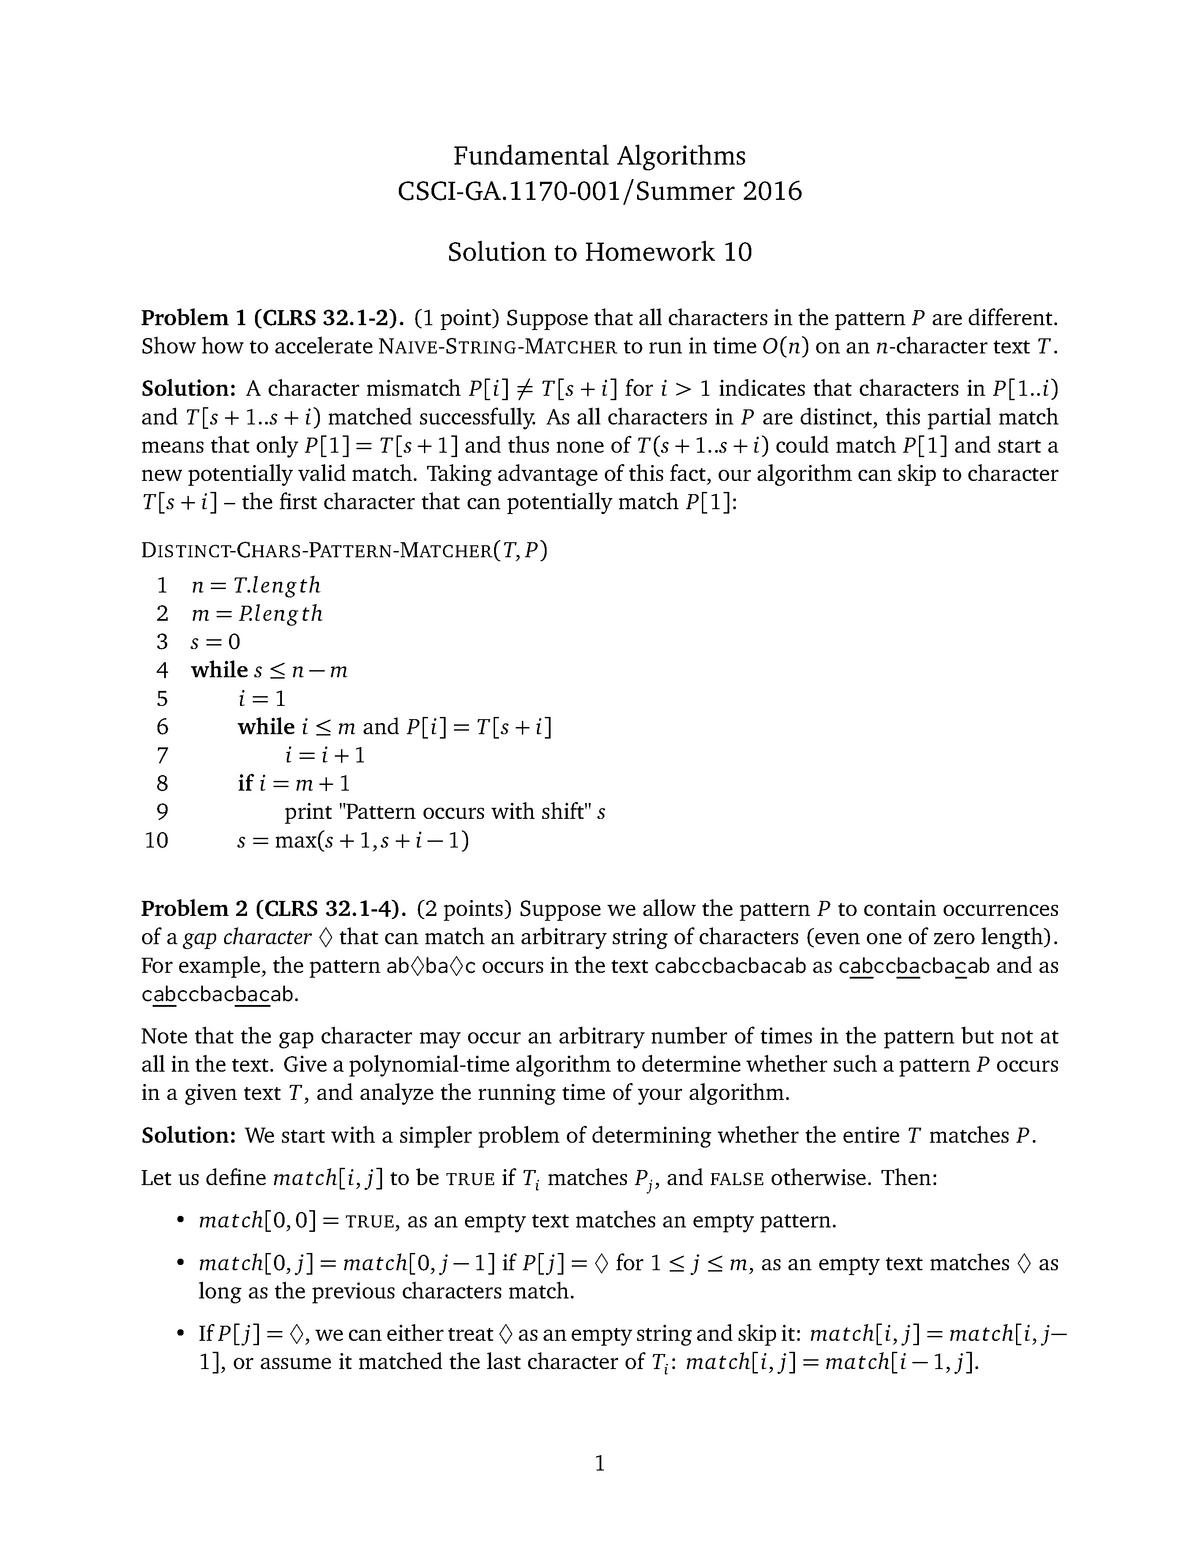 Hw10sol - Assignment 10 Solution - CSCI-GA 1170 - NYU - StuDocu